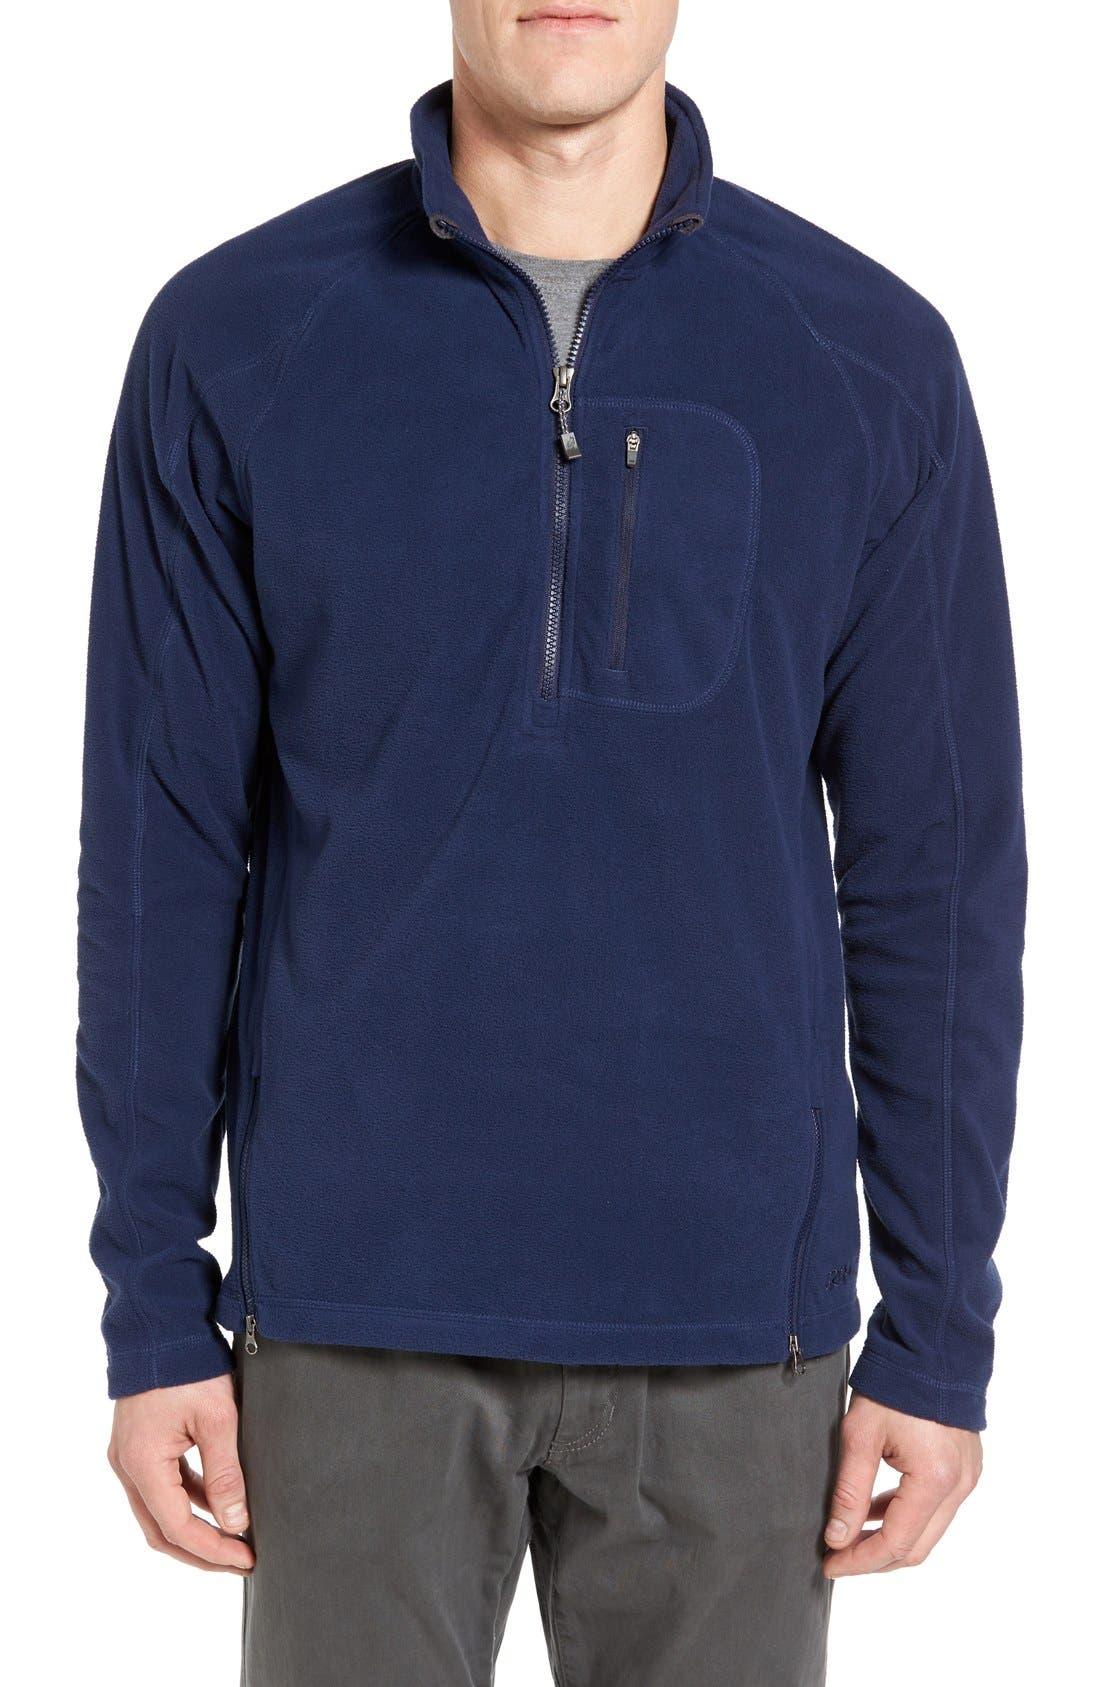 Gramicci Utility Quarter Zip Fleece Sweater